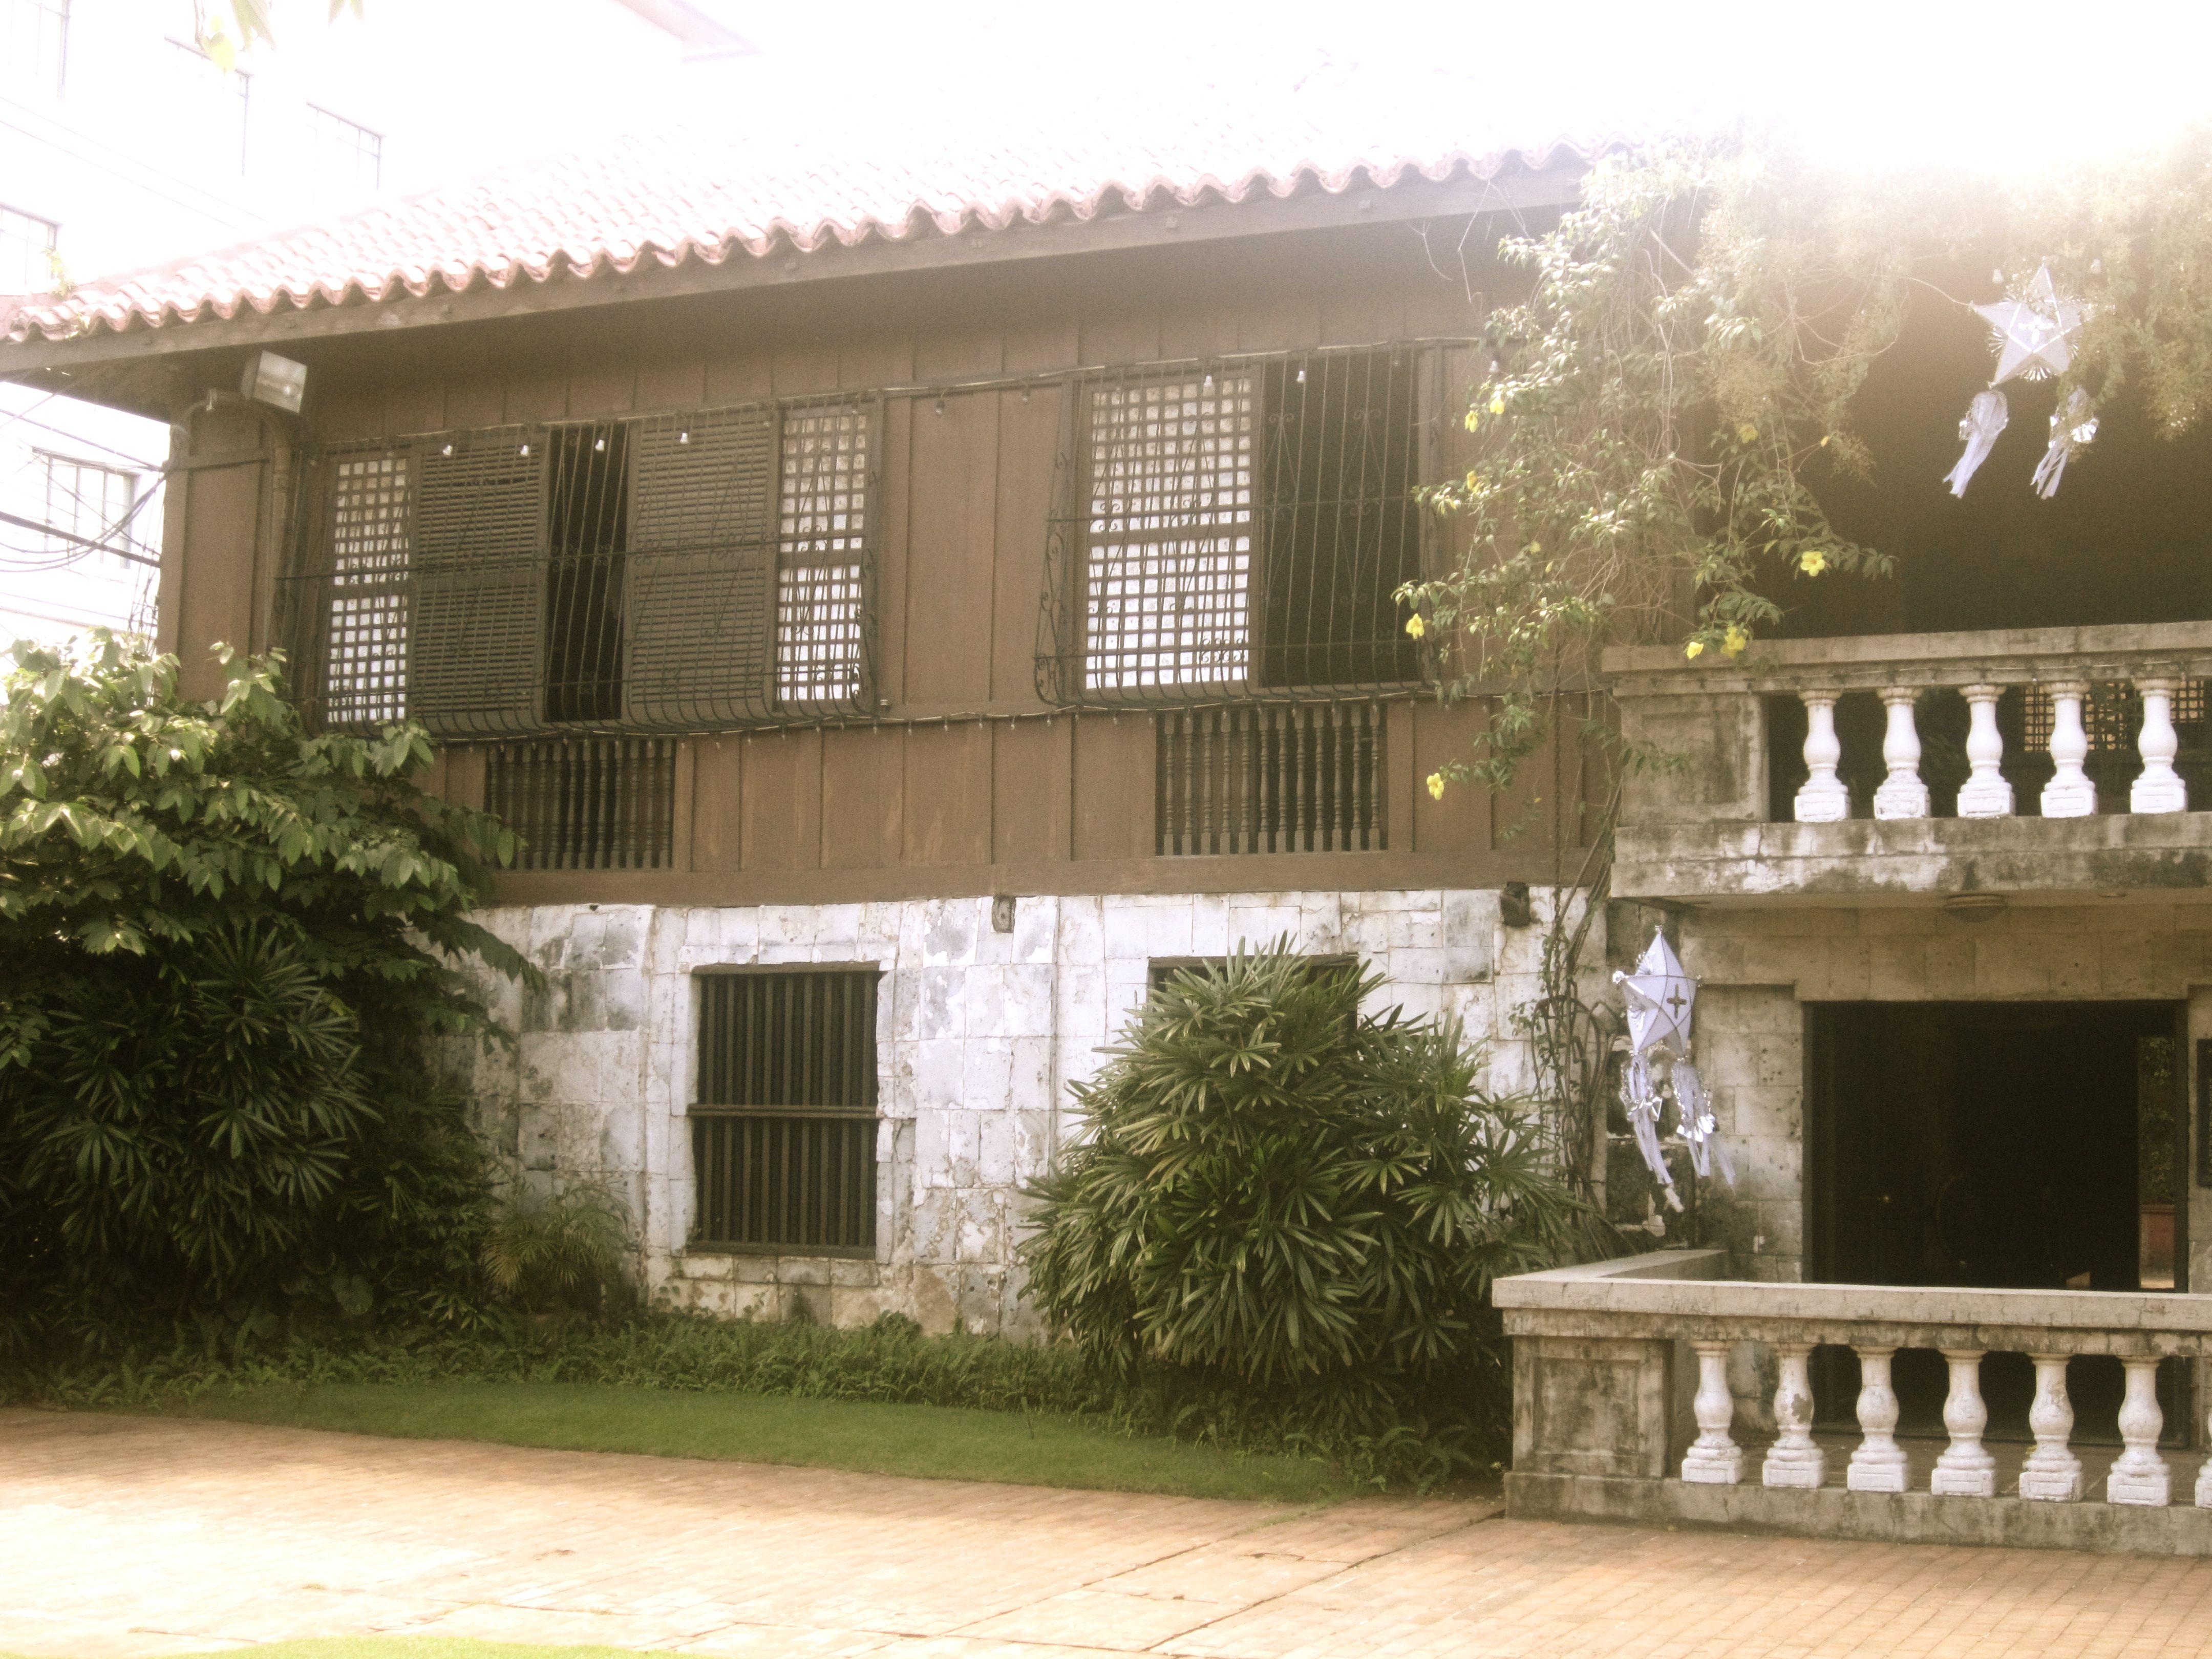 casa gorordo (cebu, philippines)   one of my fave heritage